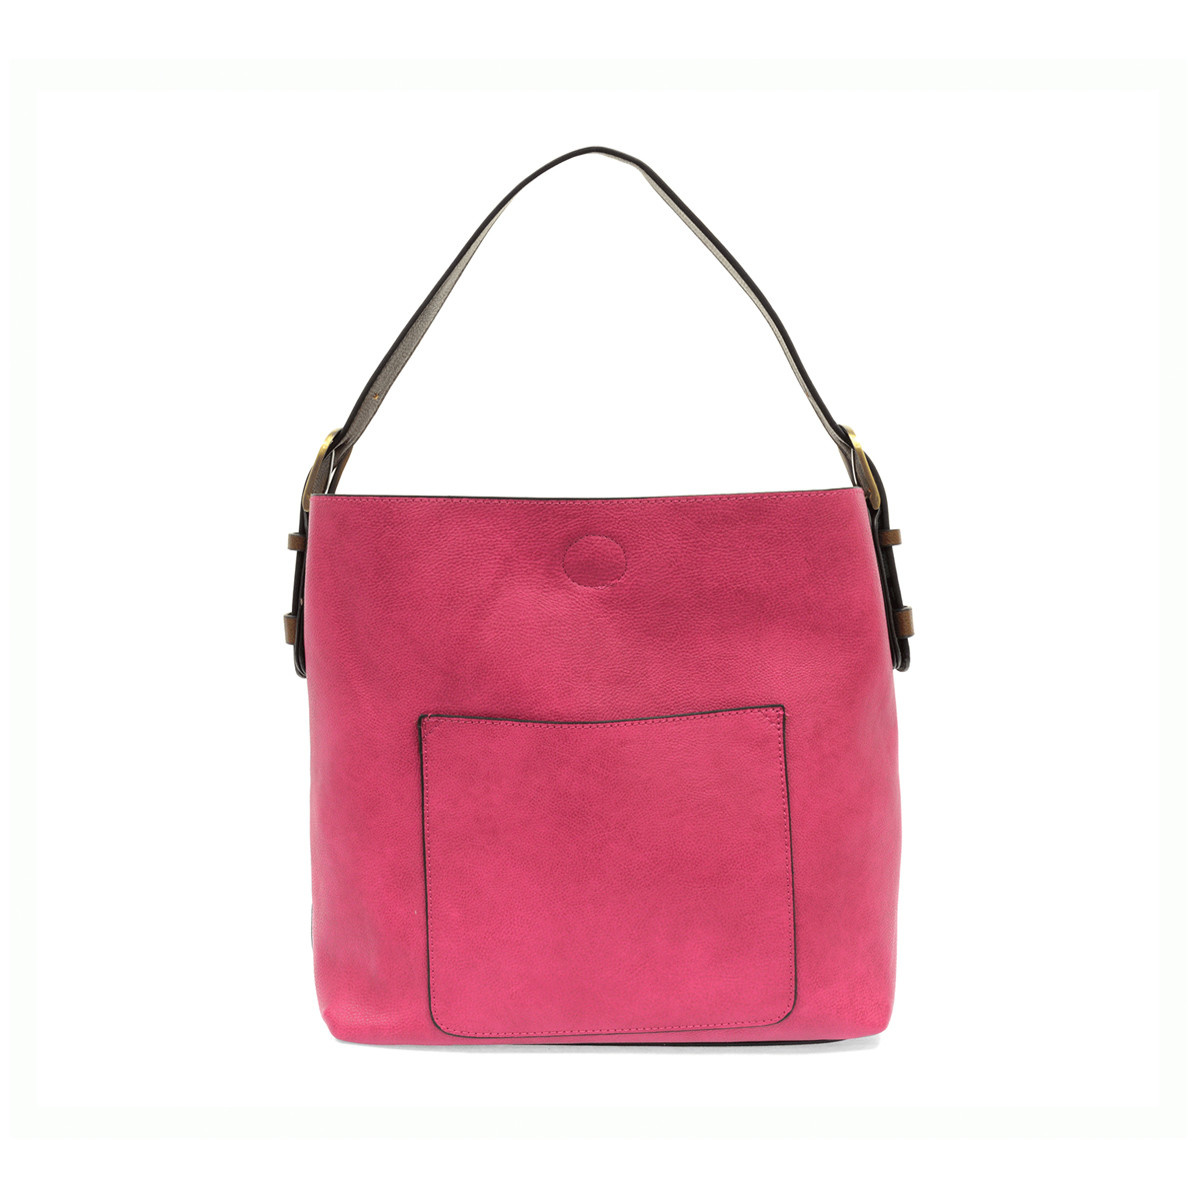 Joy Susan Joy Susan Classic Hobo Handbag Fuchsia